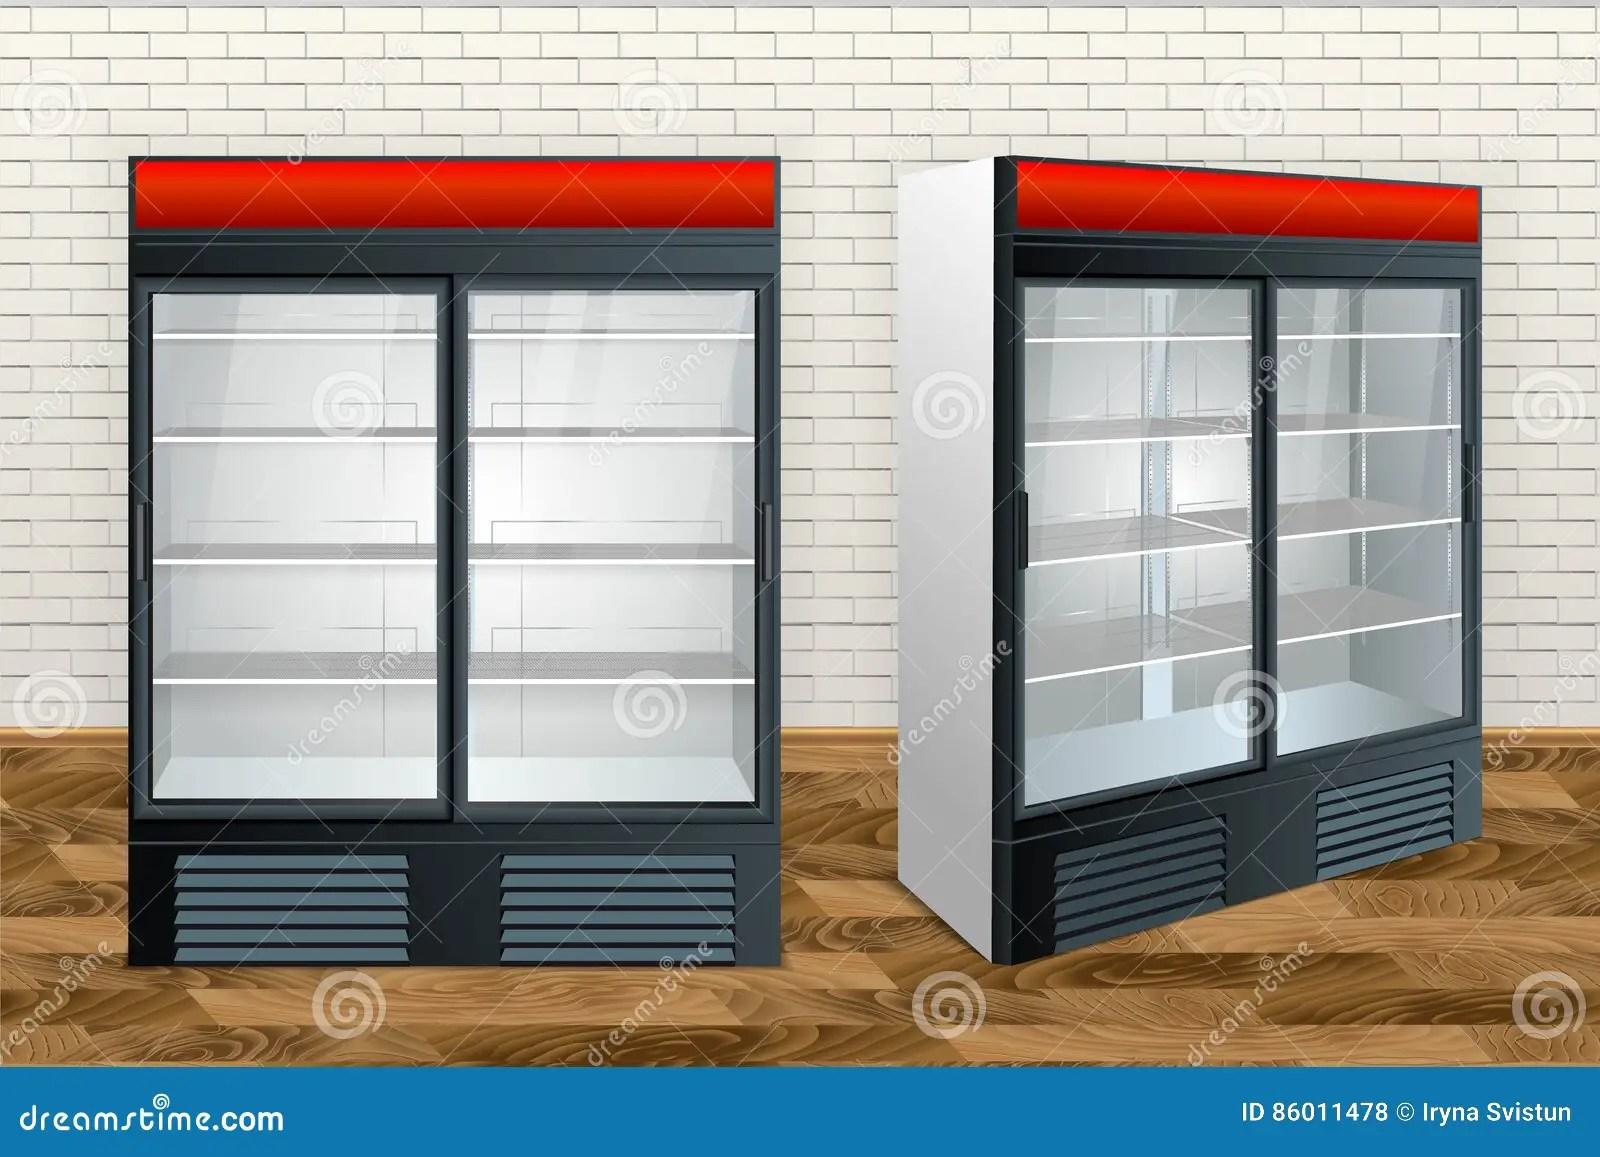 kitchen showrooms used cabinets craigslist 冰箱陈列室厨房库存例证 插画包括有减速火箭 开放 厨房 舒适 氟利昂 冰箱陈列室厨房